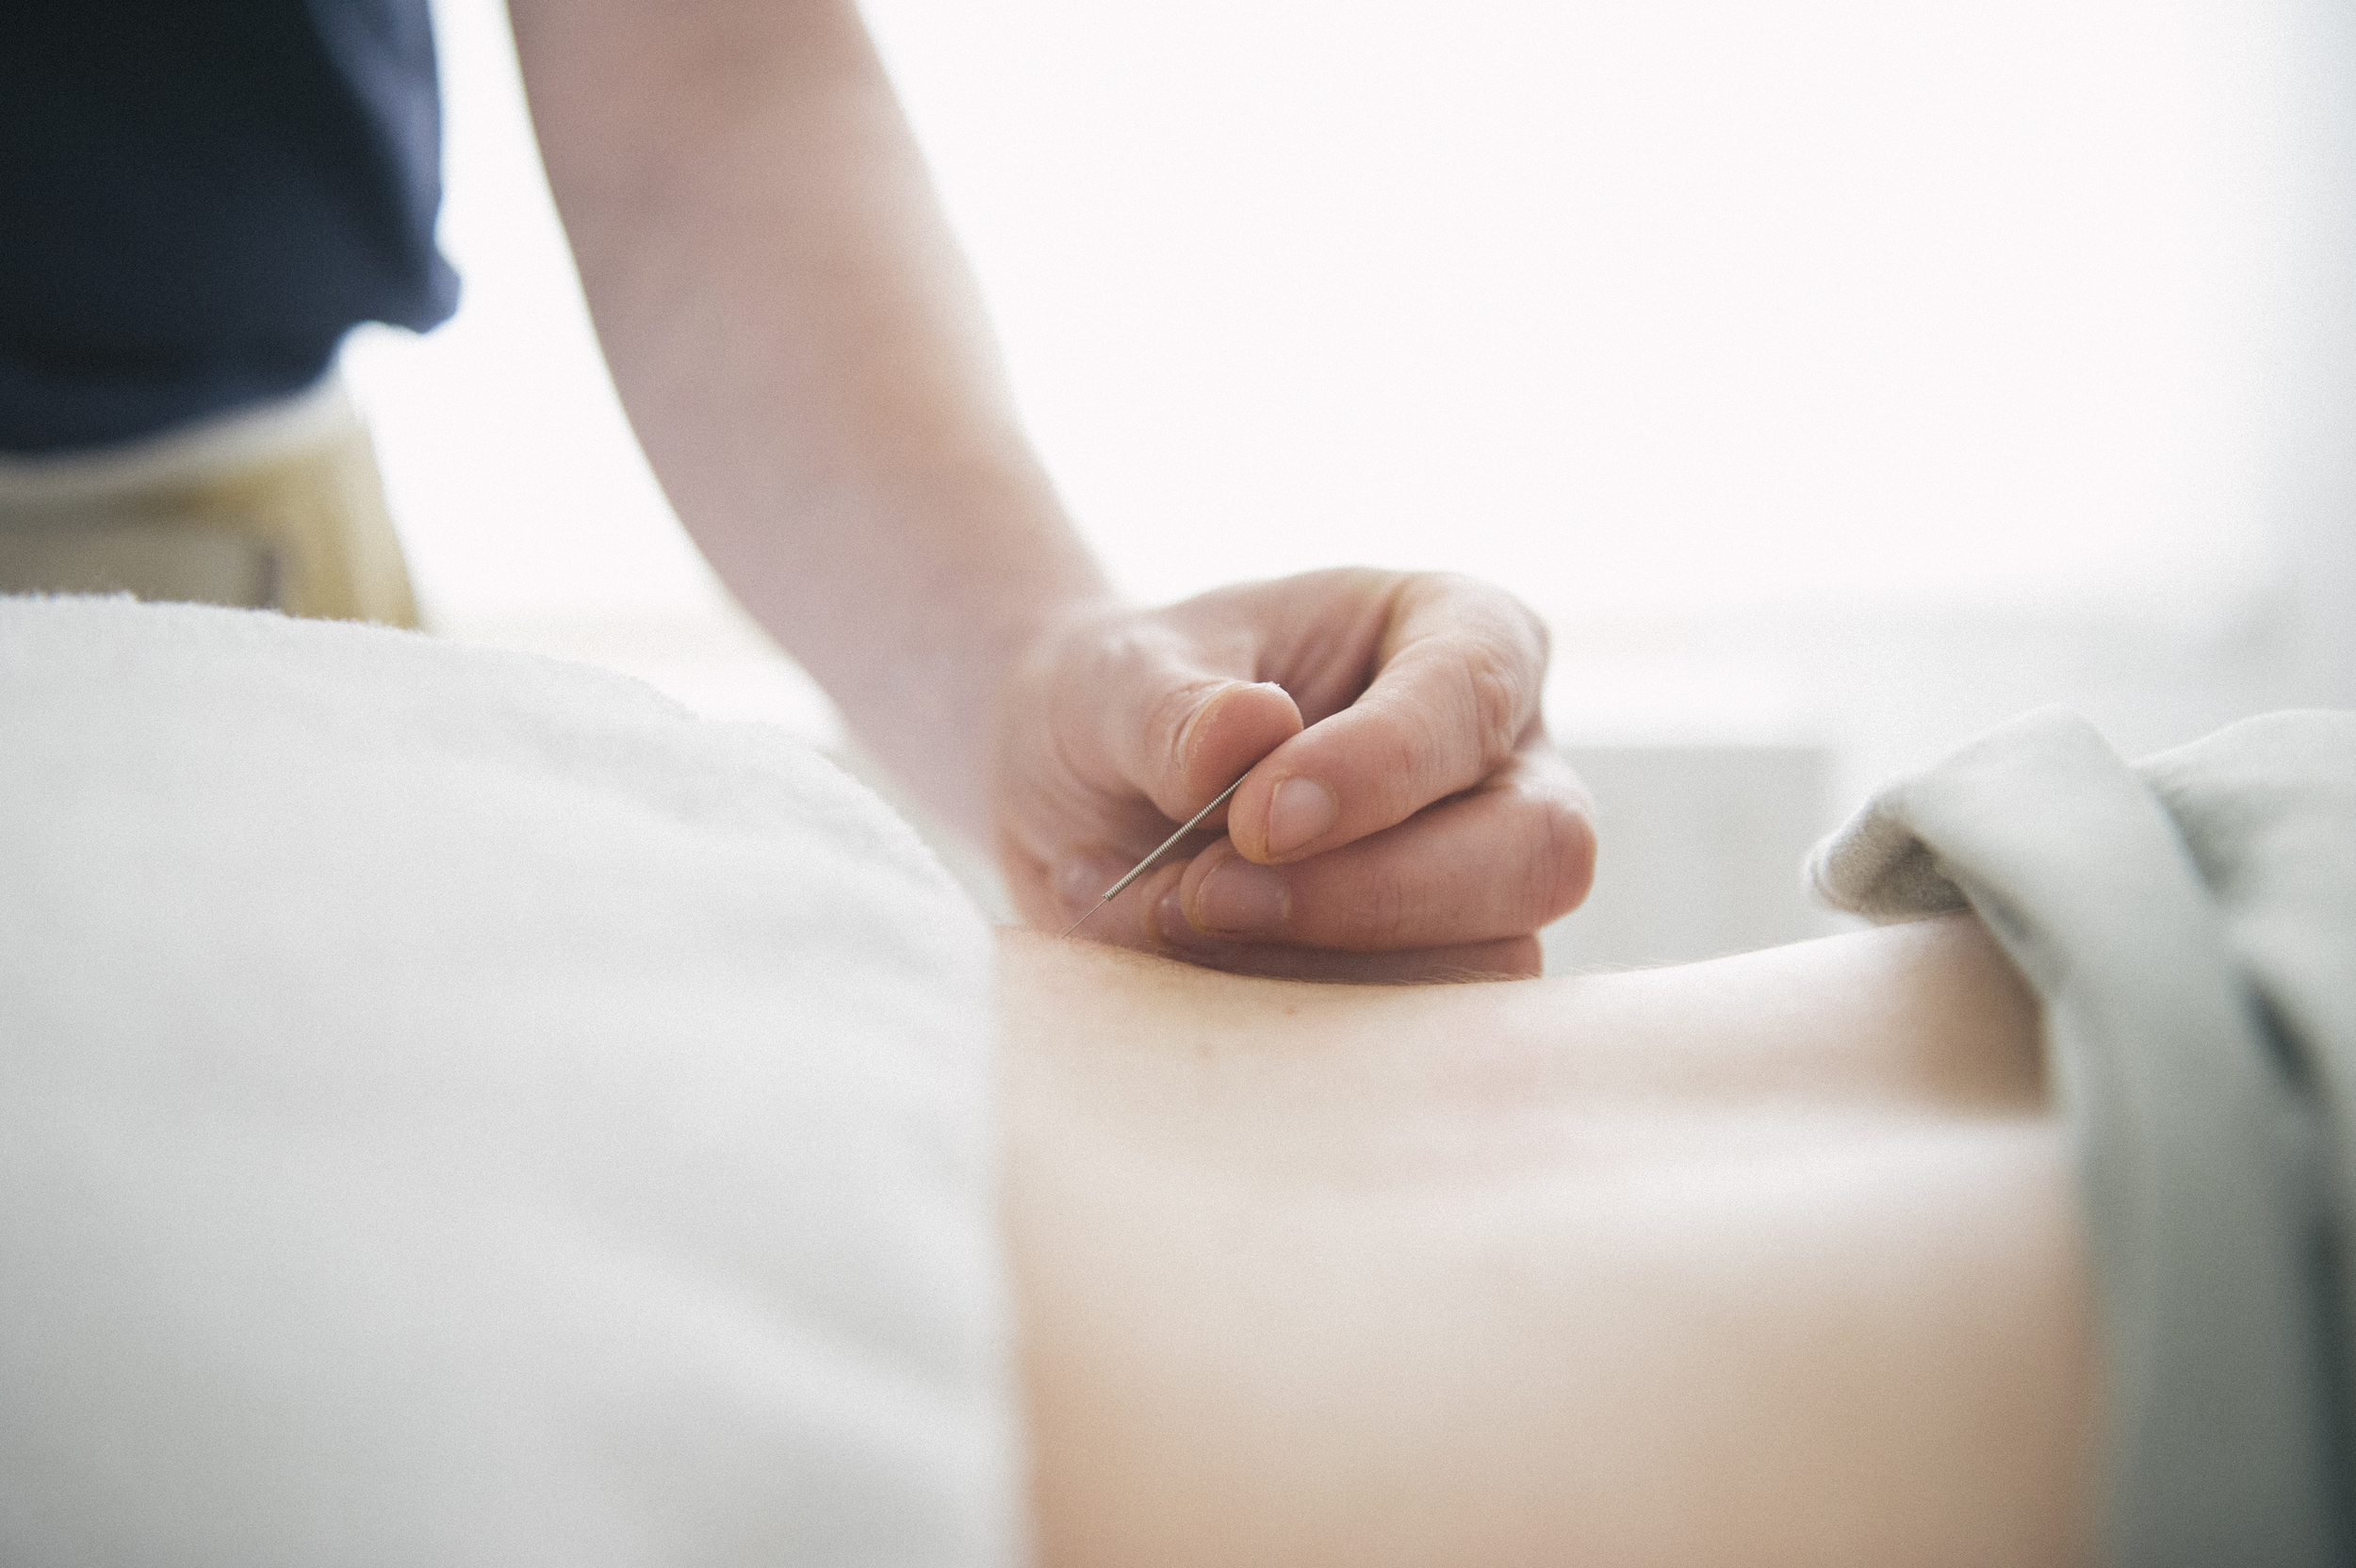 PPT Clinic, dry needling, physio, Dublin